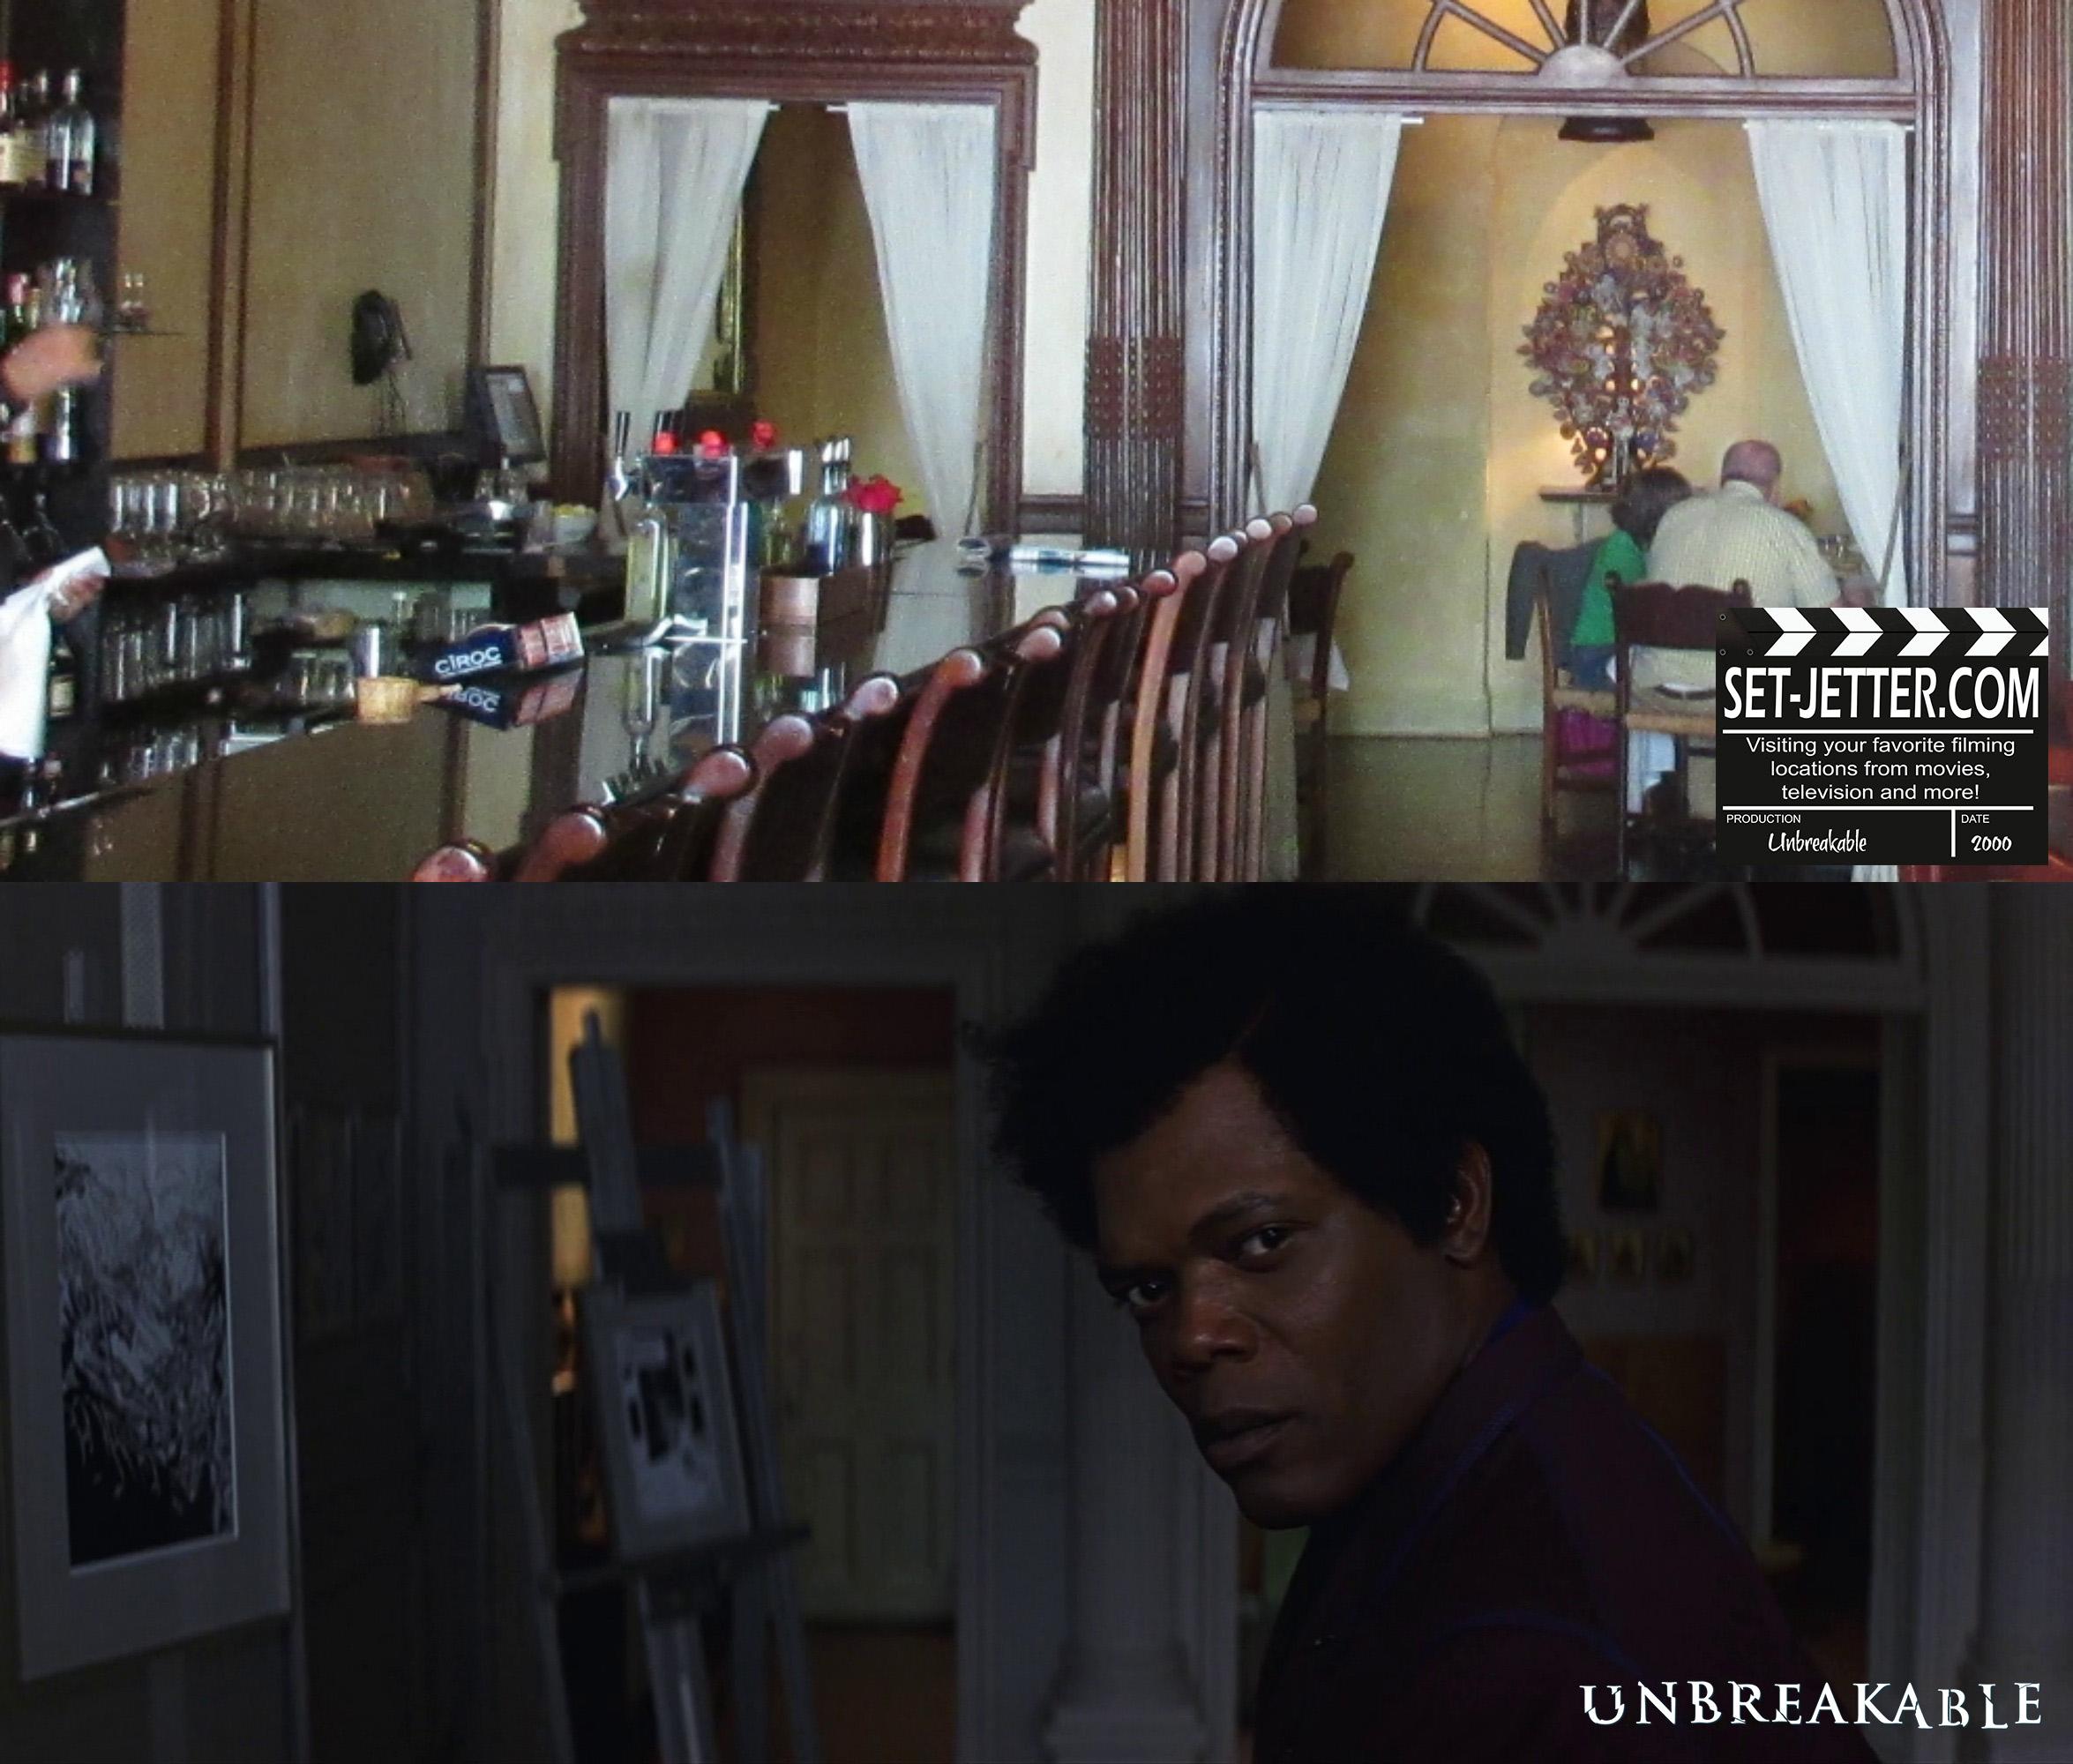 Unbreakable 006.jpg